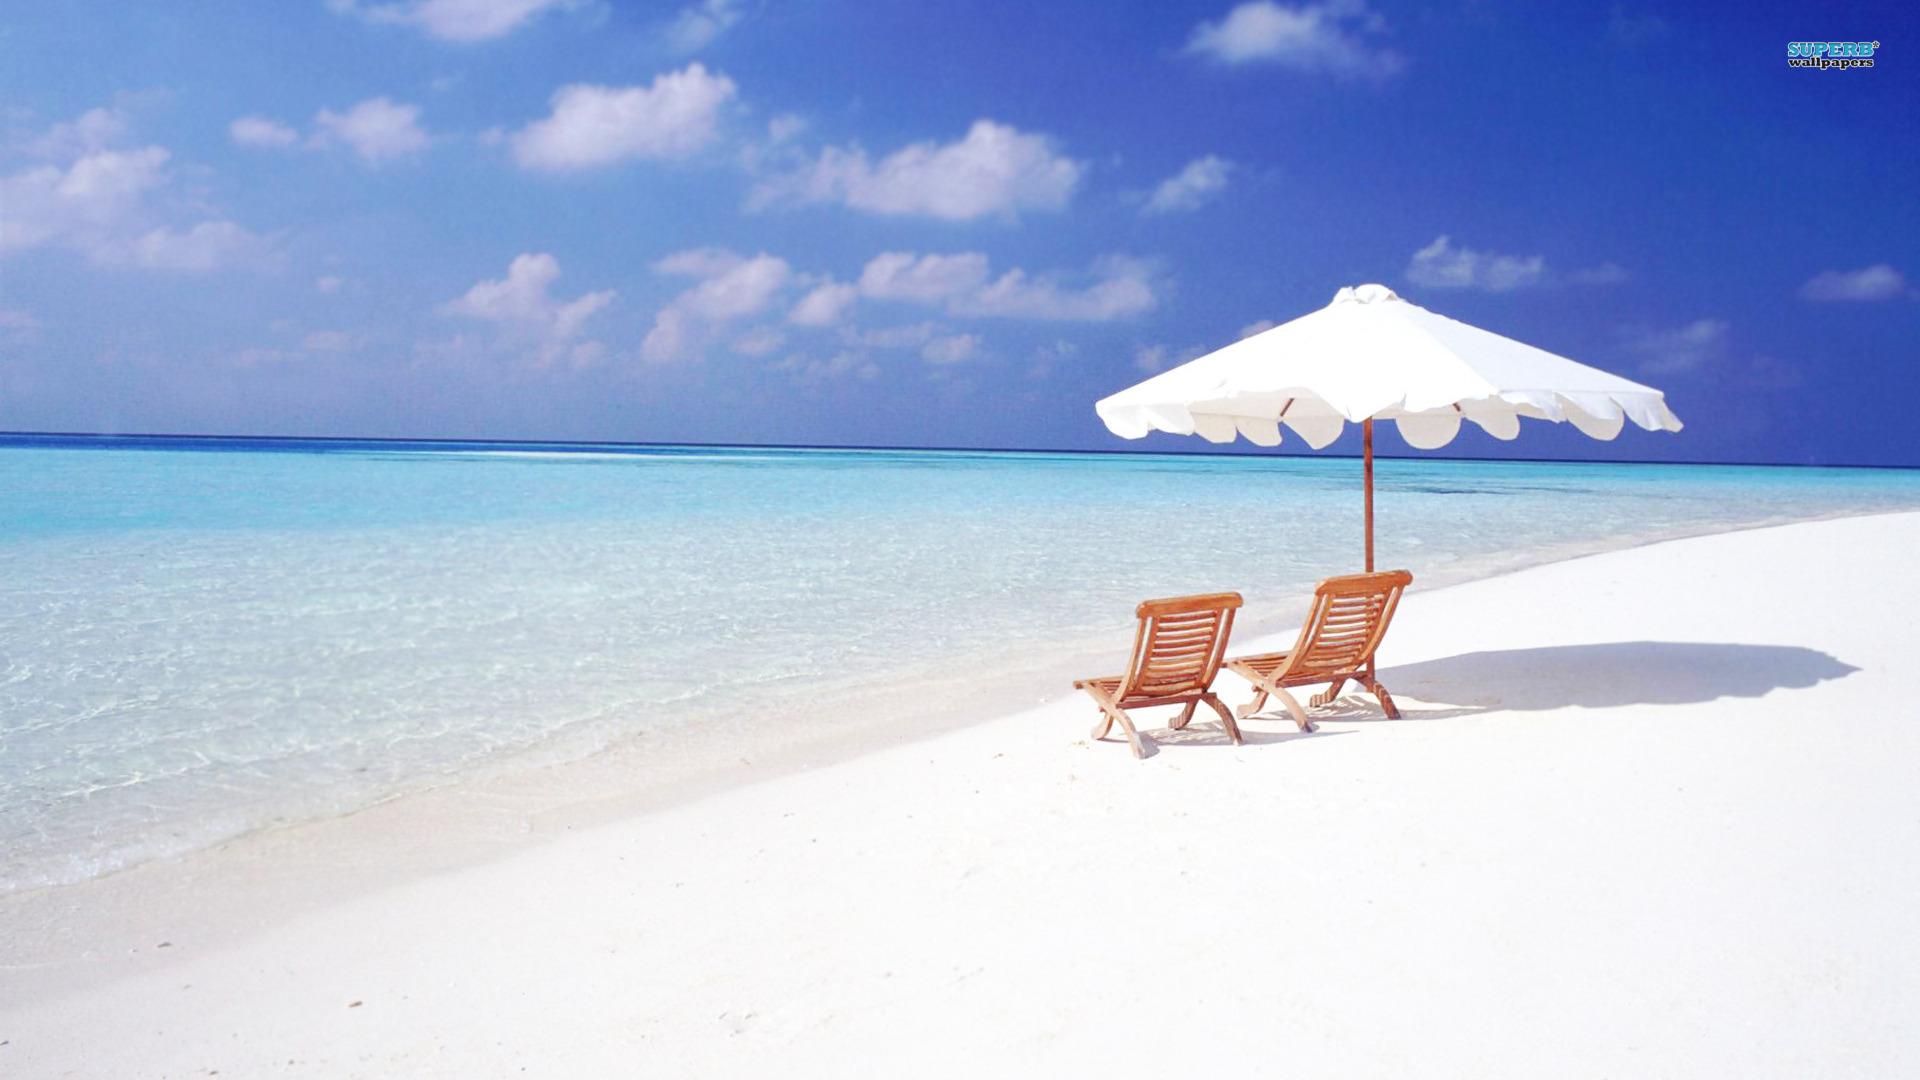 Relaxing HD Wallpapers - WallpaperSafari Relaxing Beach Background